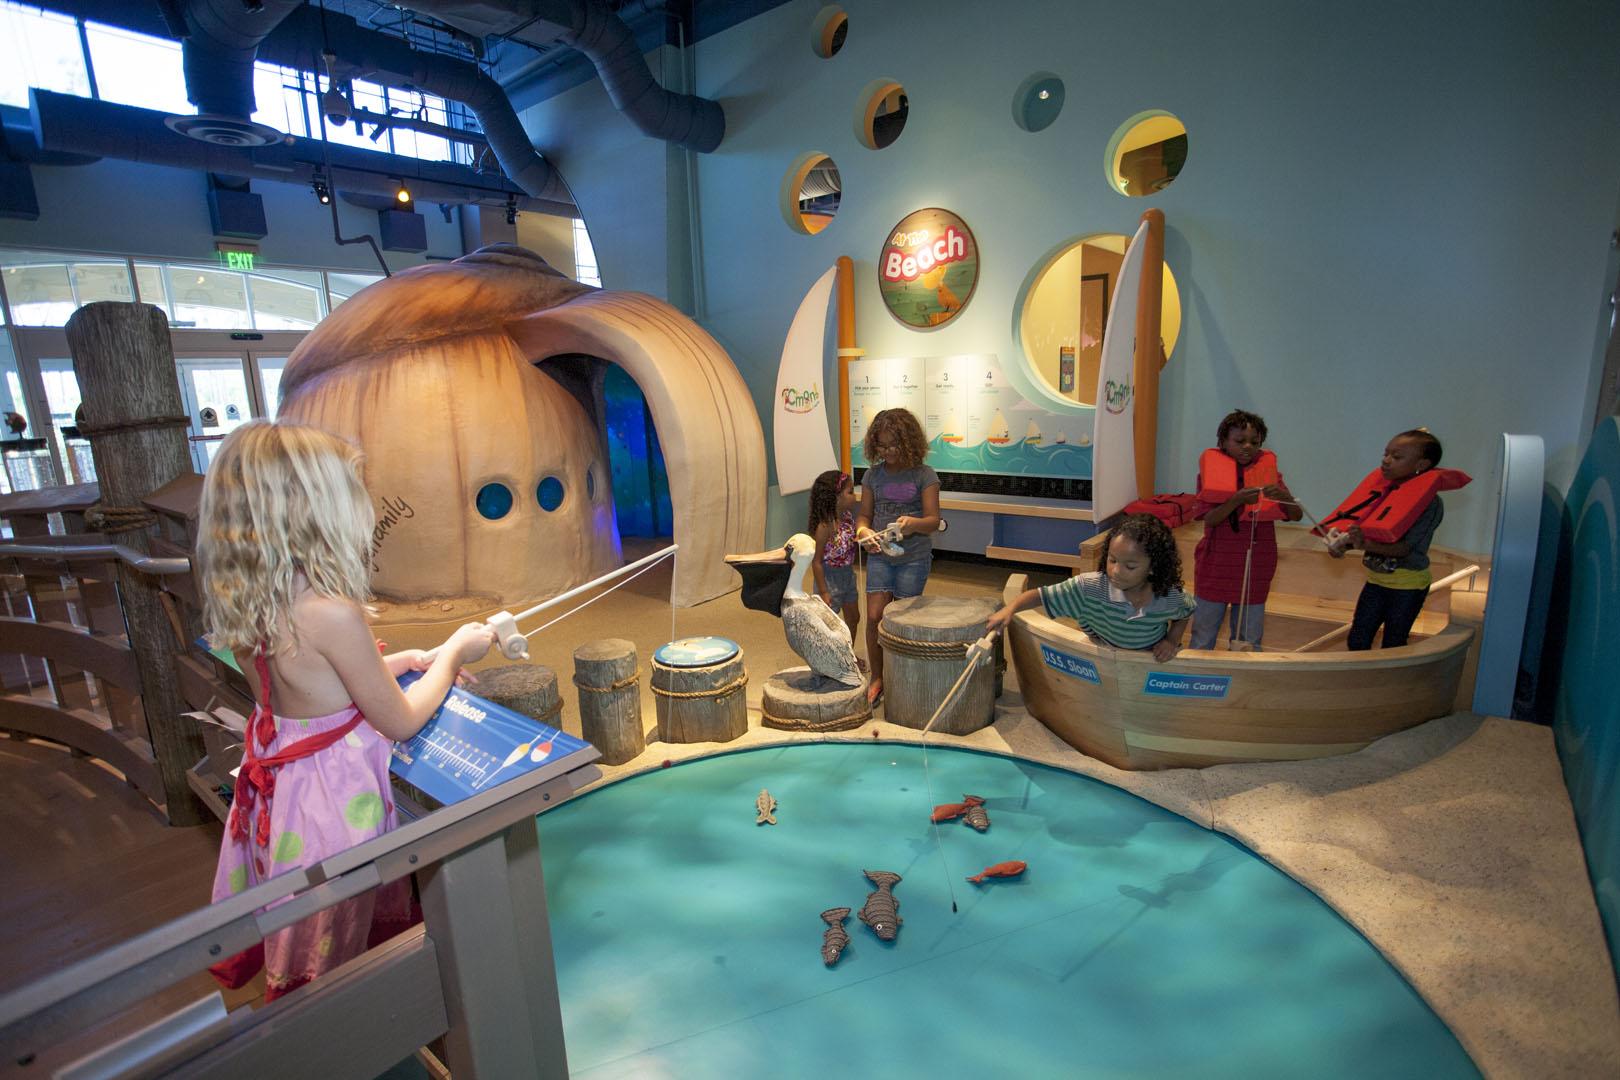 Kids Exhibition Booth : Exhibits c mon golisano children s museum of naples